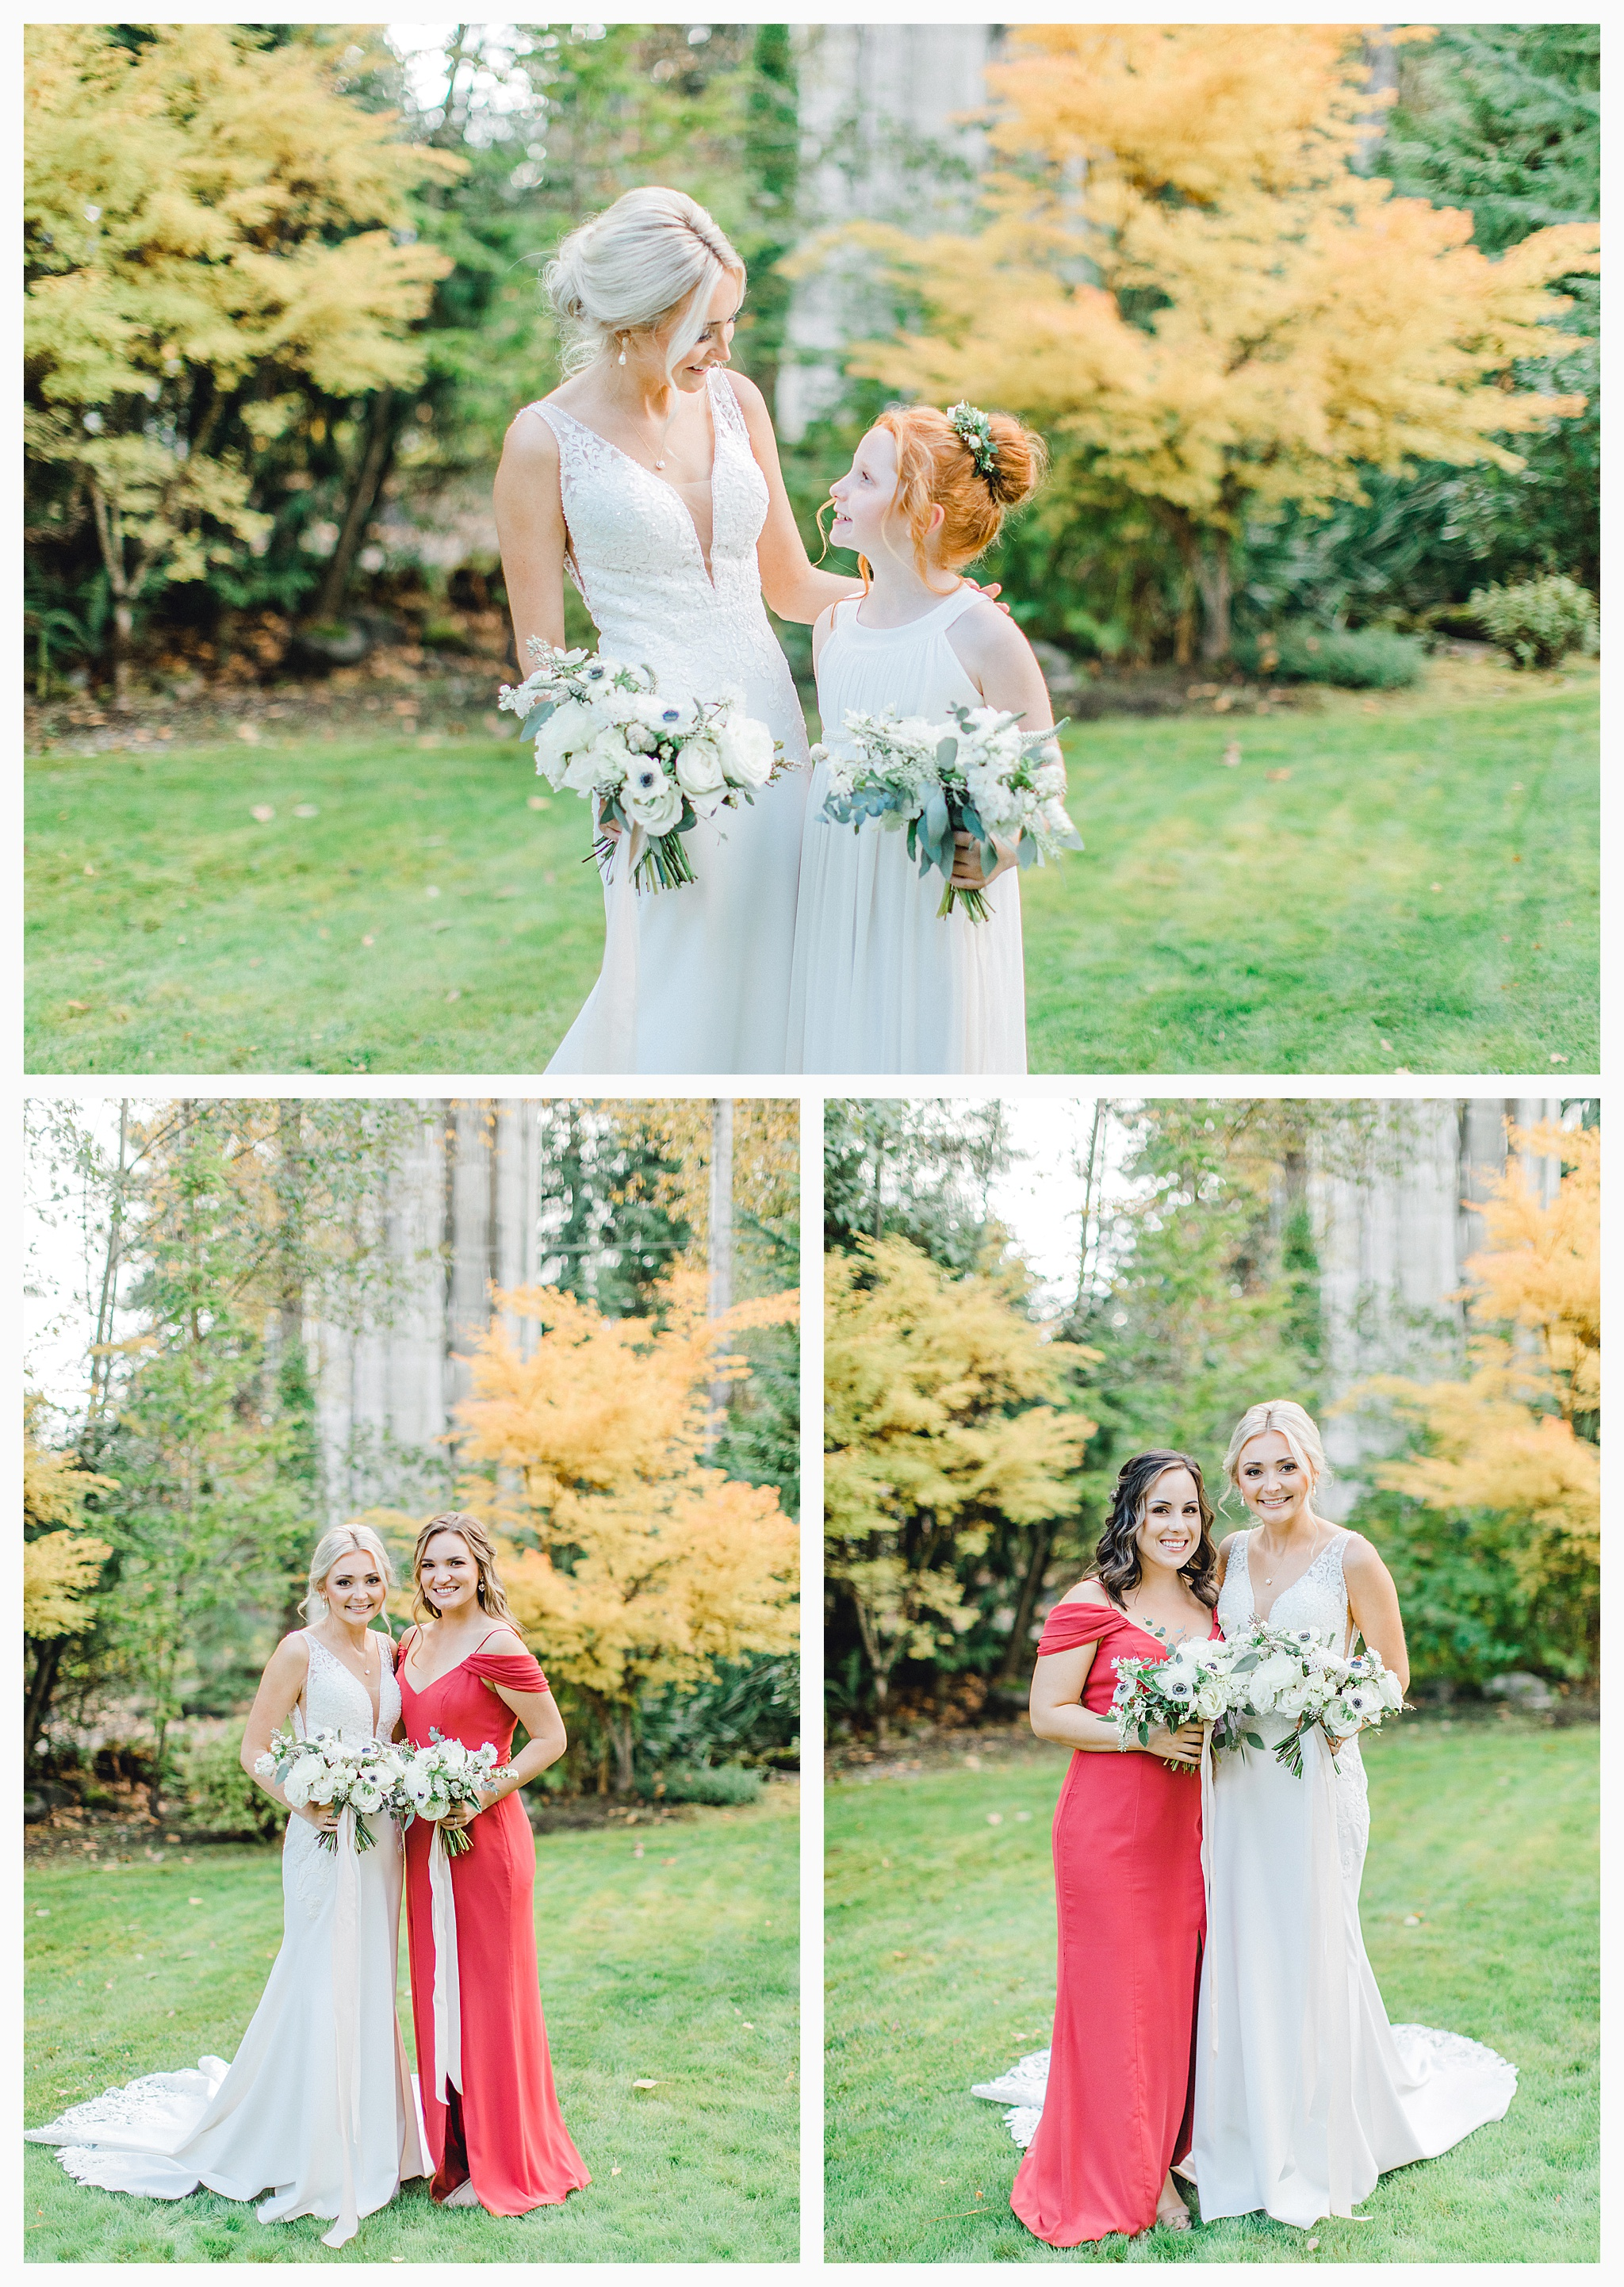 Emma Rose Company Light and Airy Wedding Photographer, Beautiful fall wedding at Rock Creek Gardens Venue in Puyallup, Washington._0046.jpg